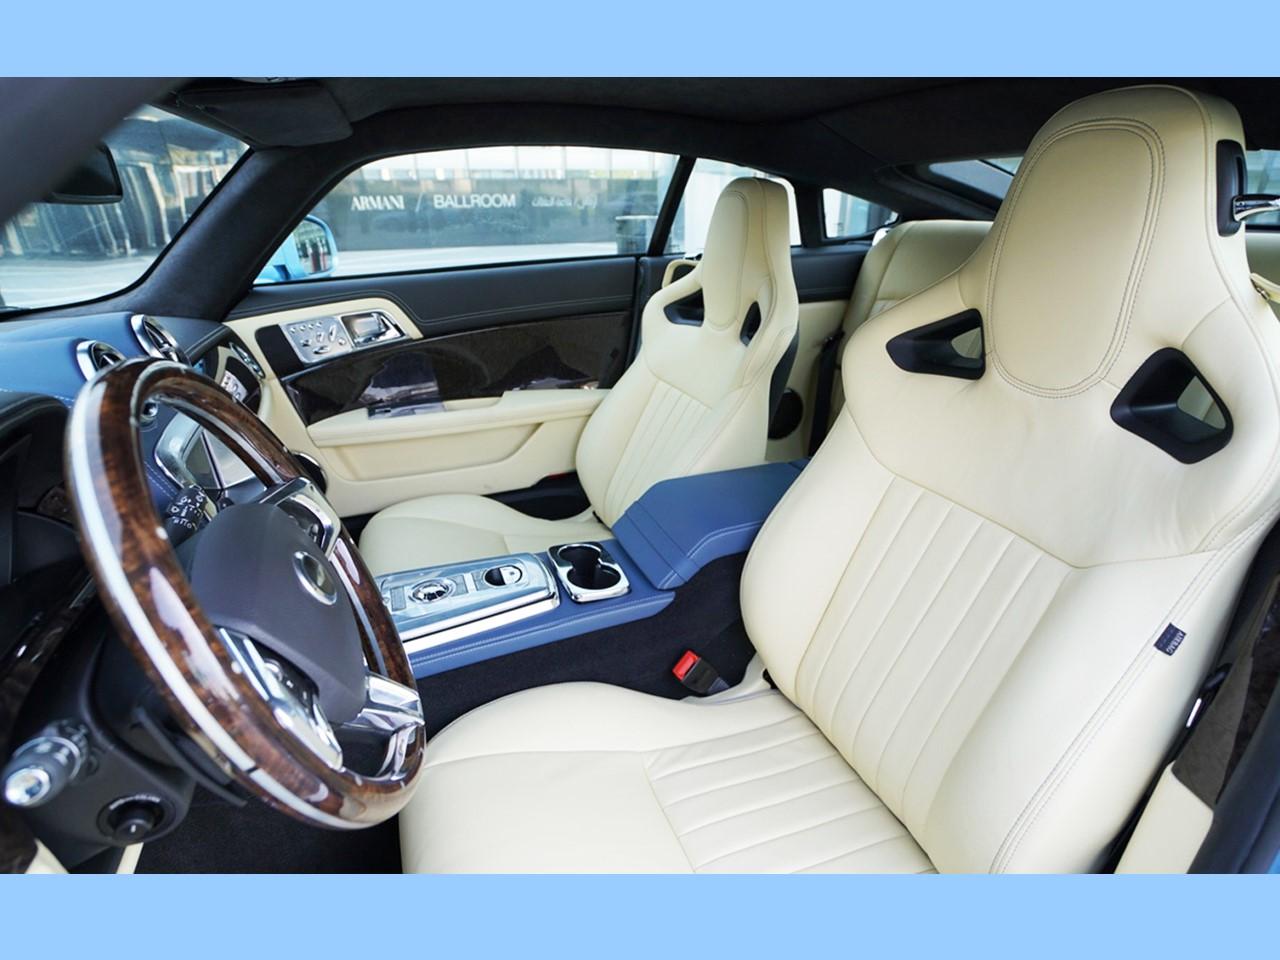 Speedback GT 29